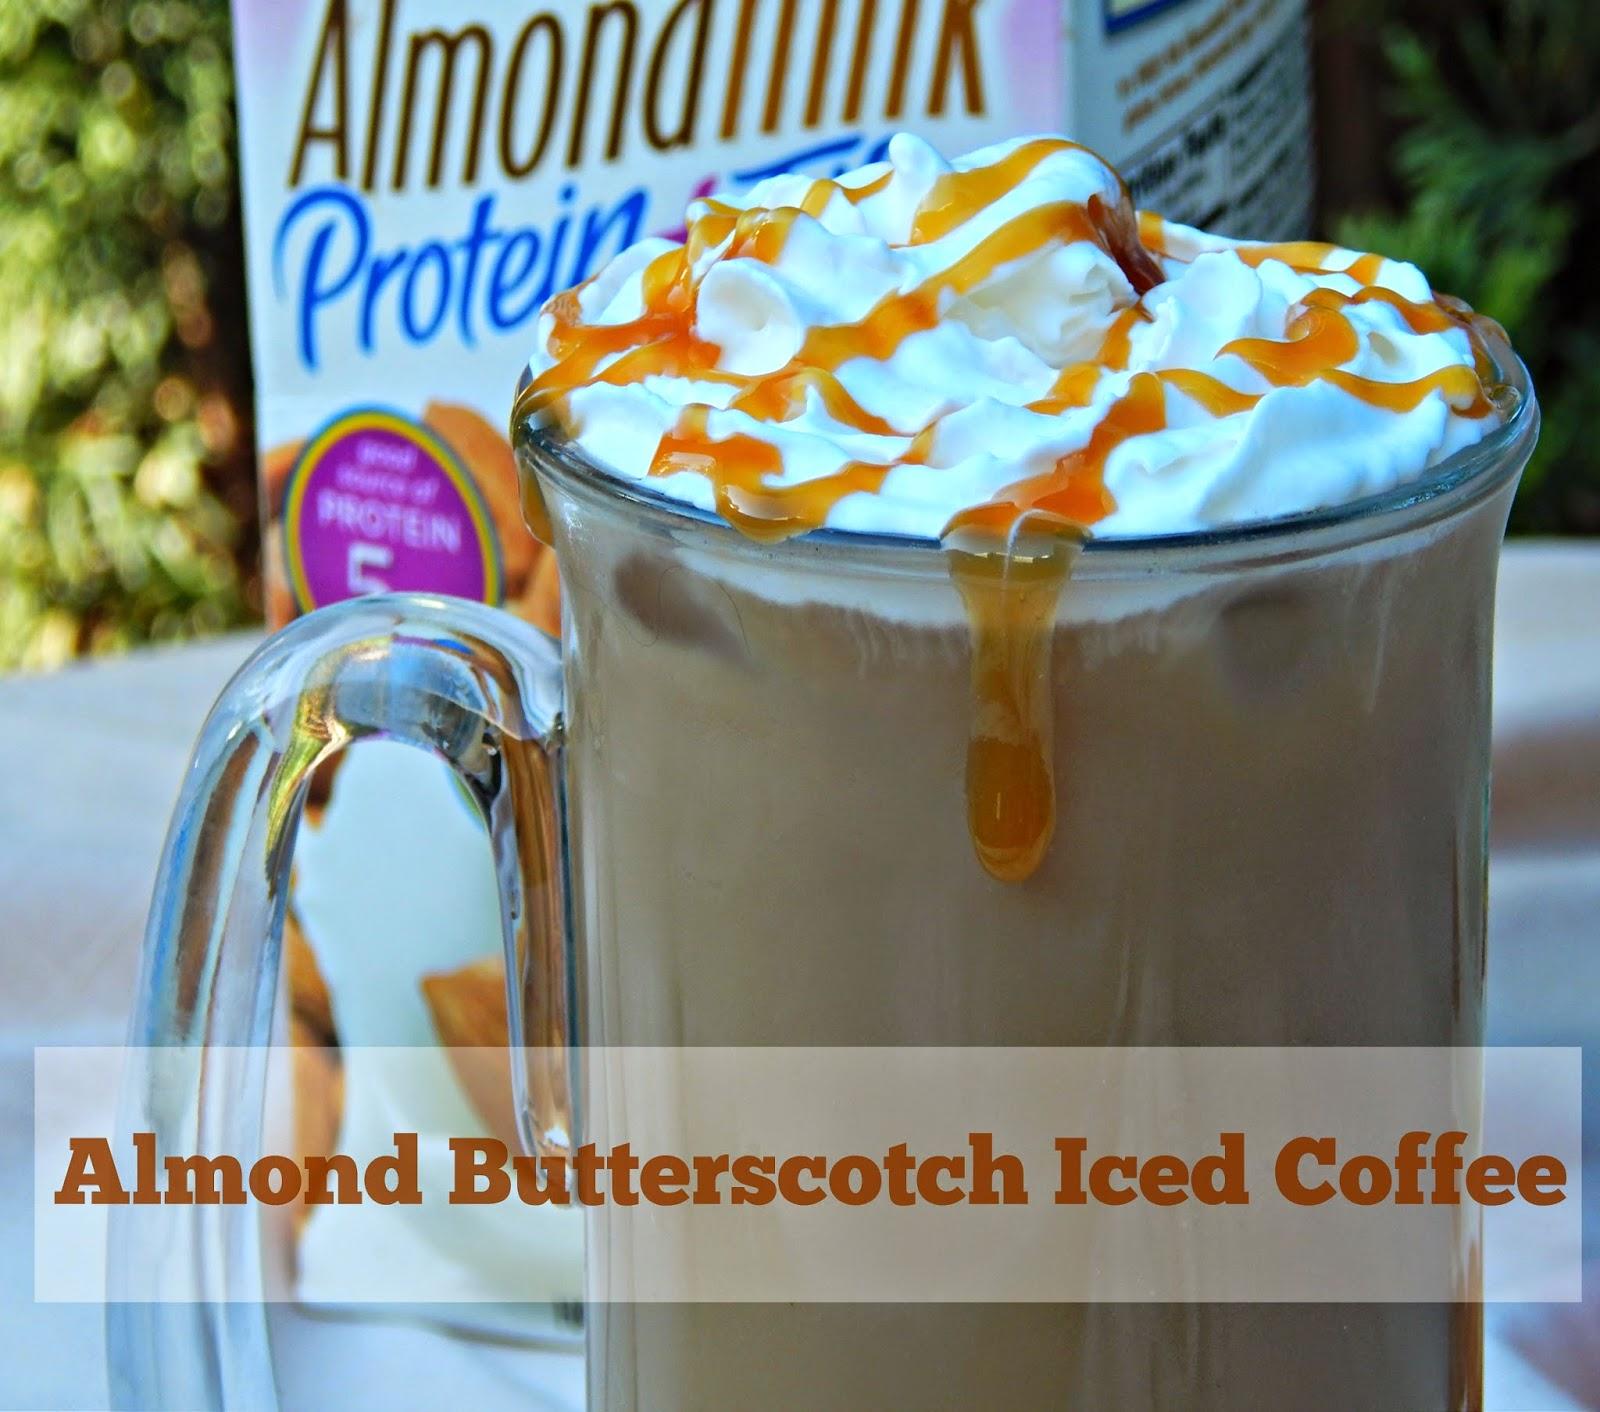 Recipe for Almond Butterscotch Iced Coffee #SilkAlmondBlends #cbias #shop